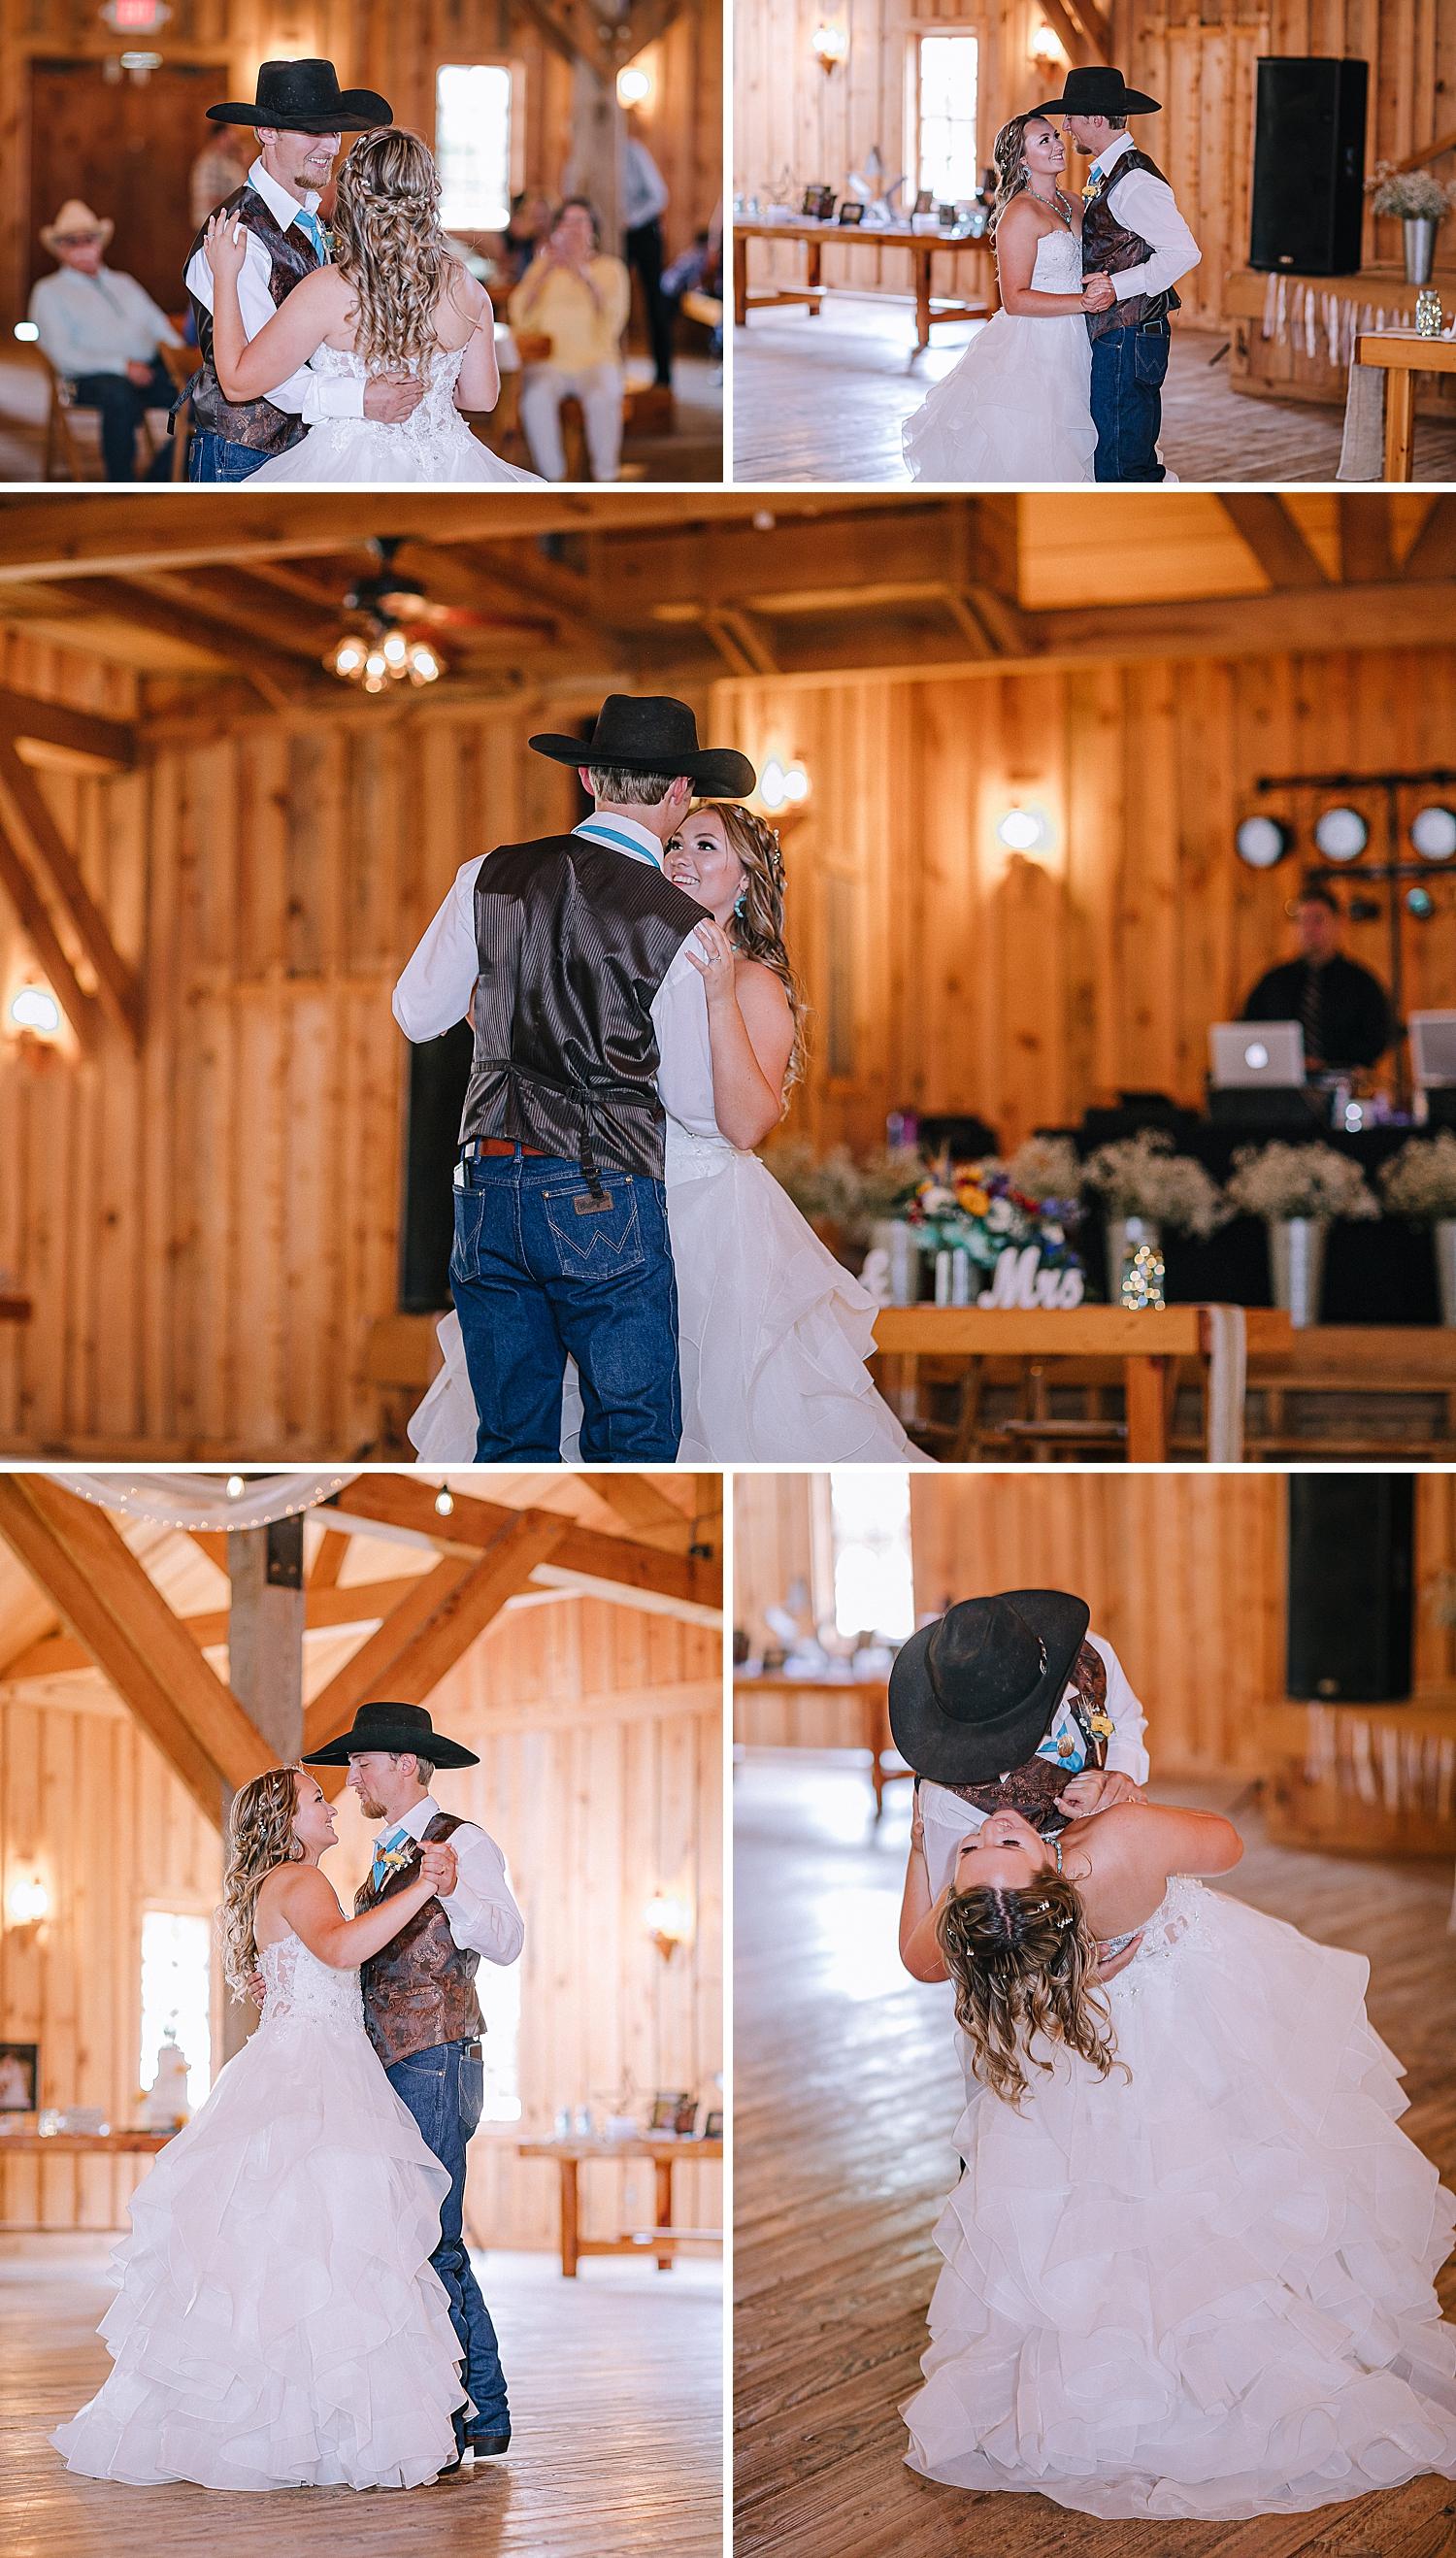 Carly-Barton-Photography-Old-Town-Texas-Rustic-Wedding-Photos-Sunflowers-Boots-Kyle-Texas_0099.jpg